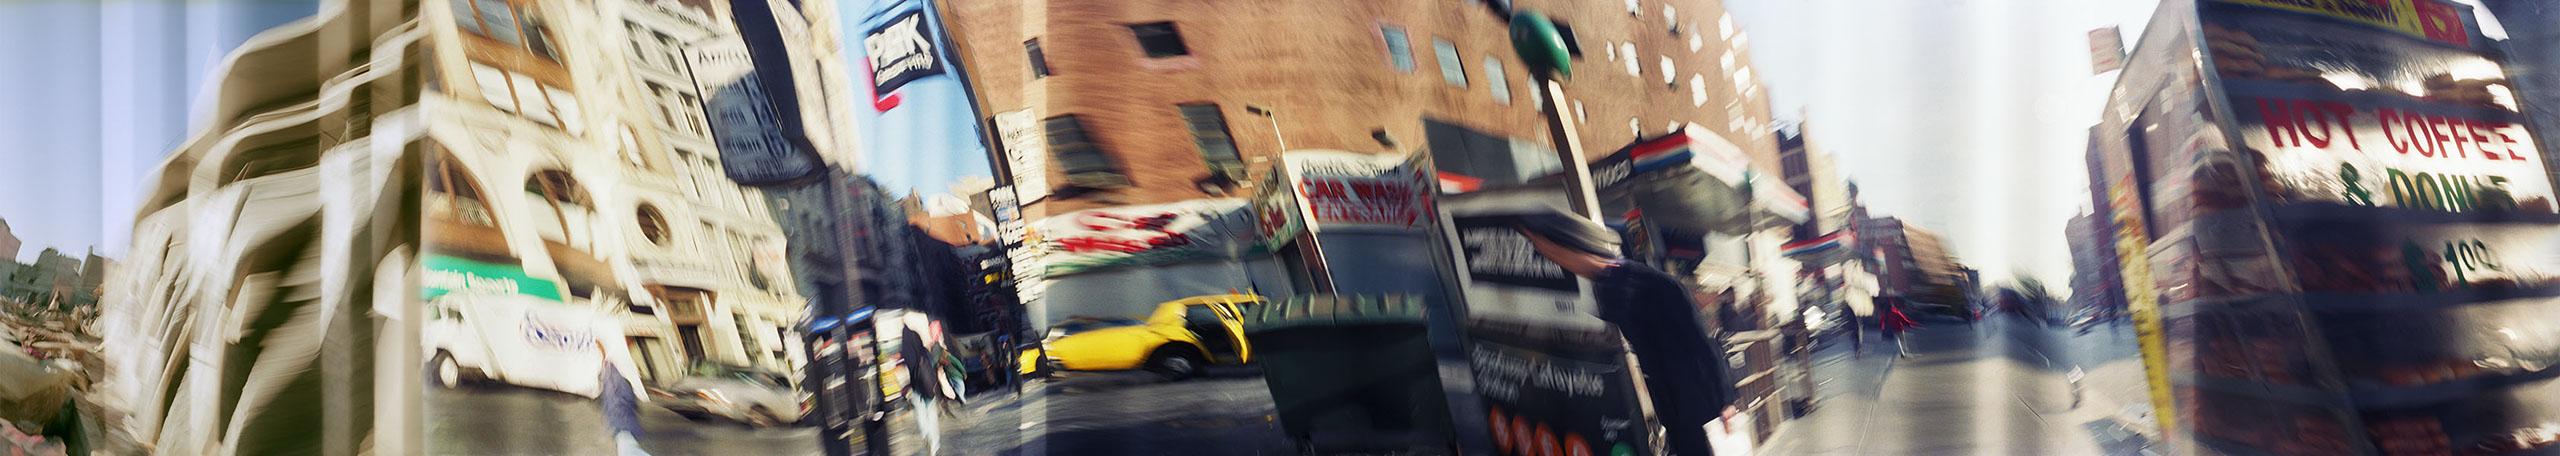 JFK New York City